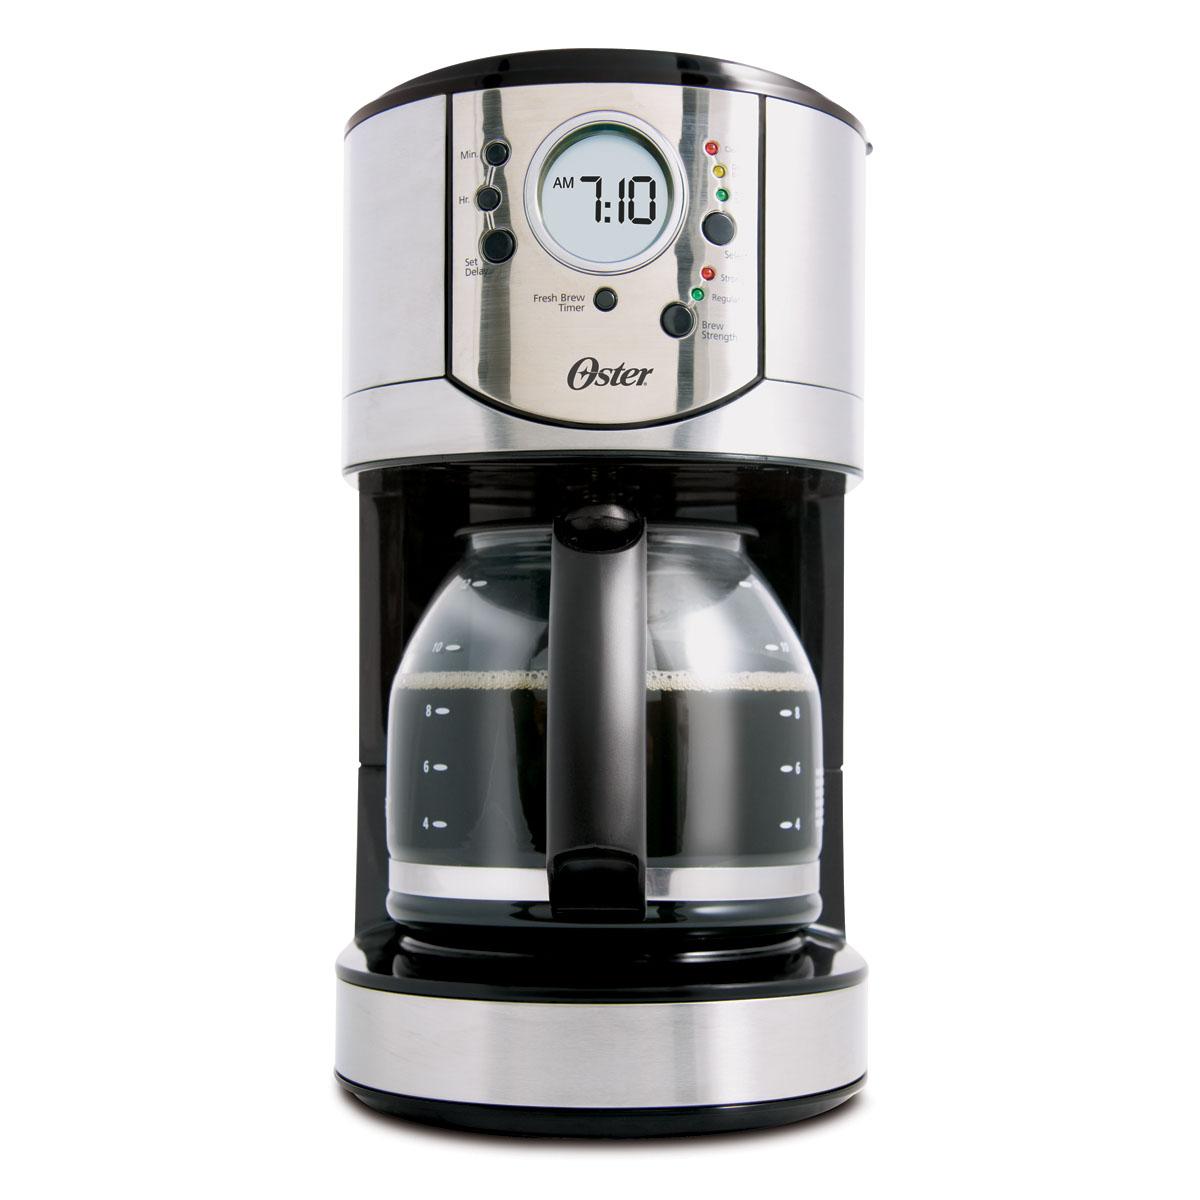 Oster 12 Cup Programmable Stainless Steel Coffee Maker Bvstcj0031